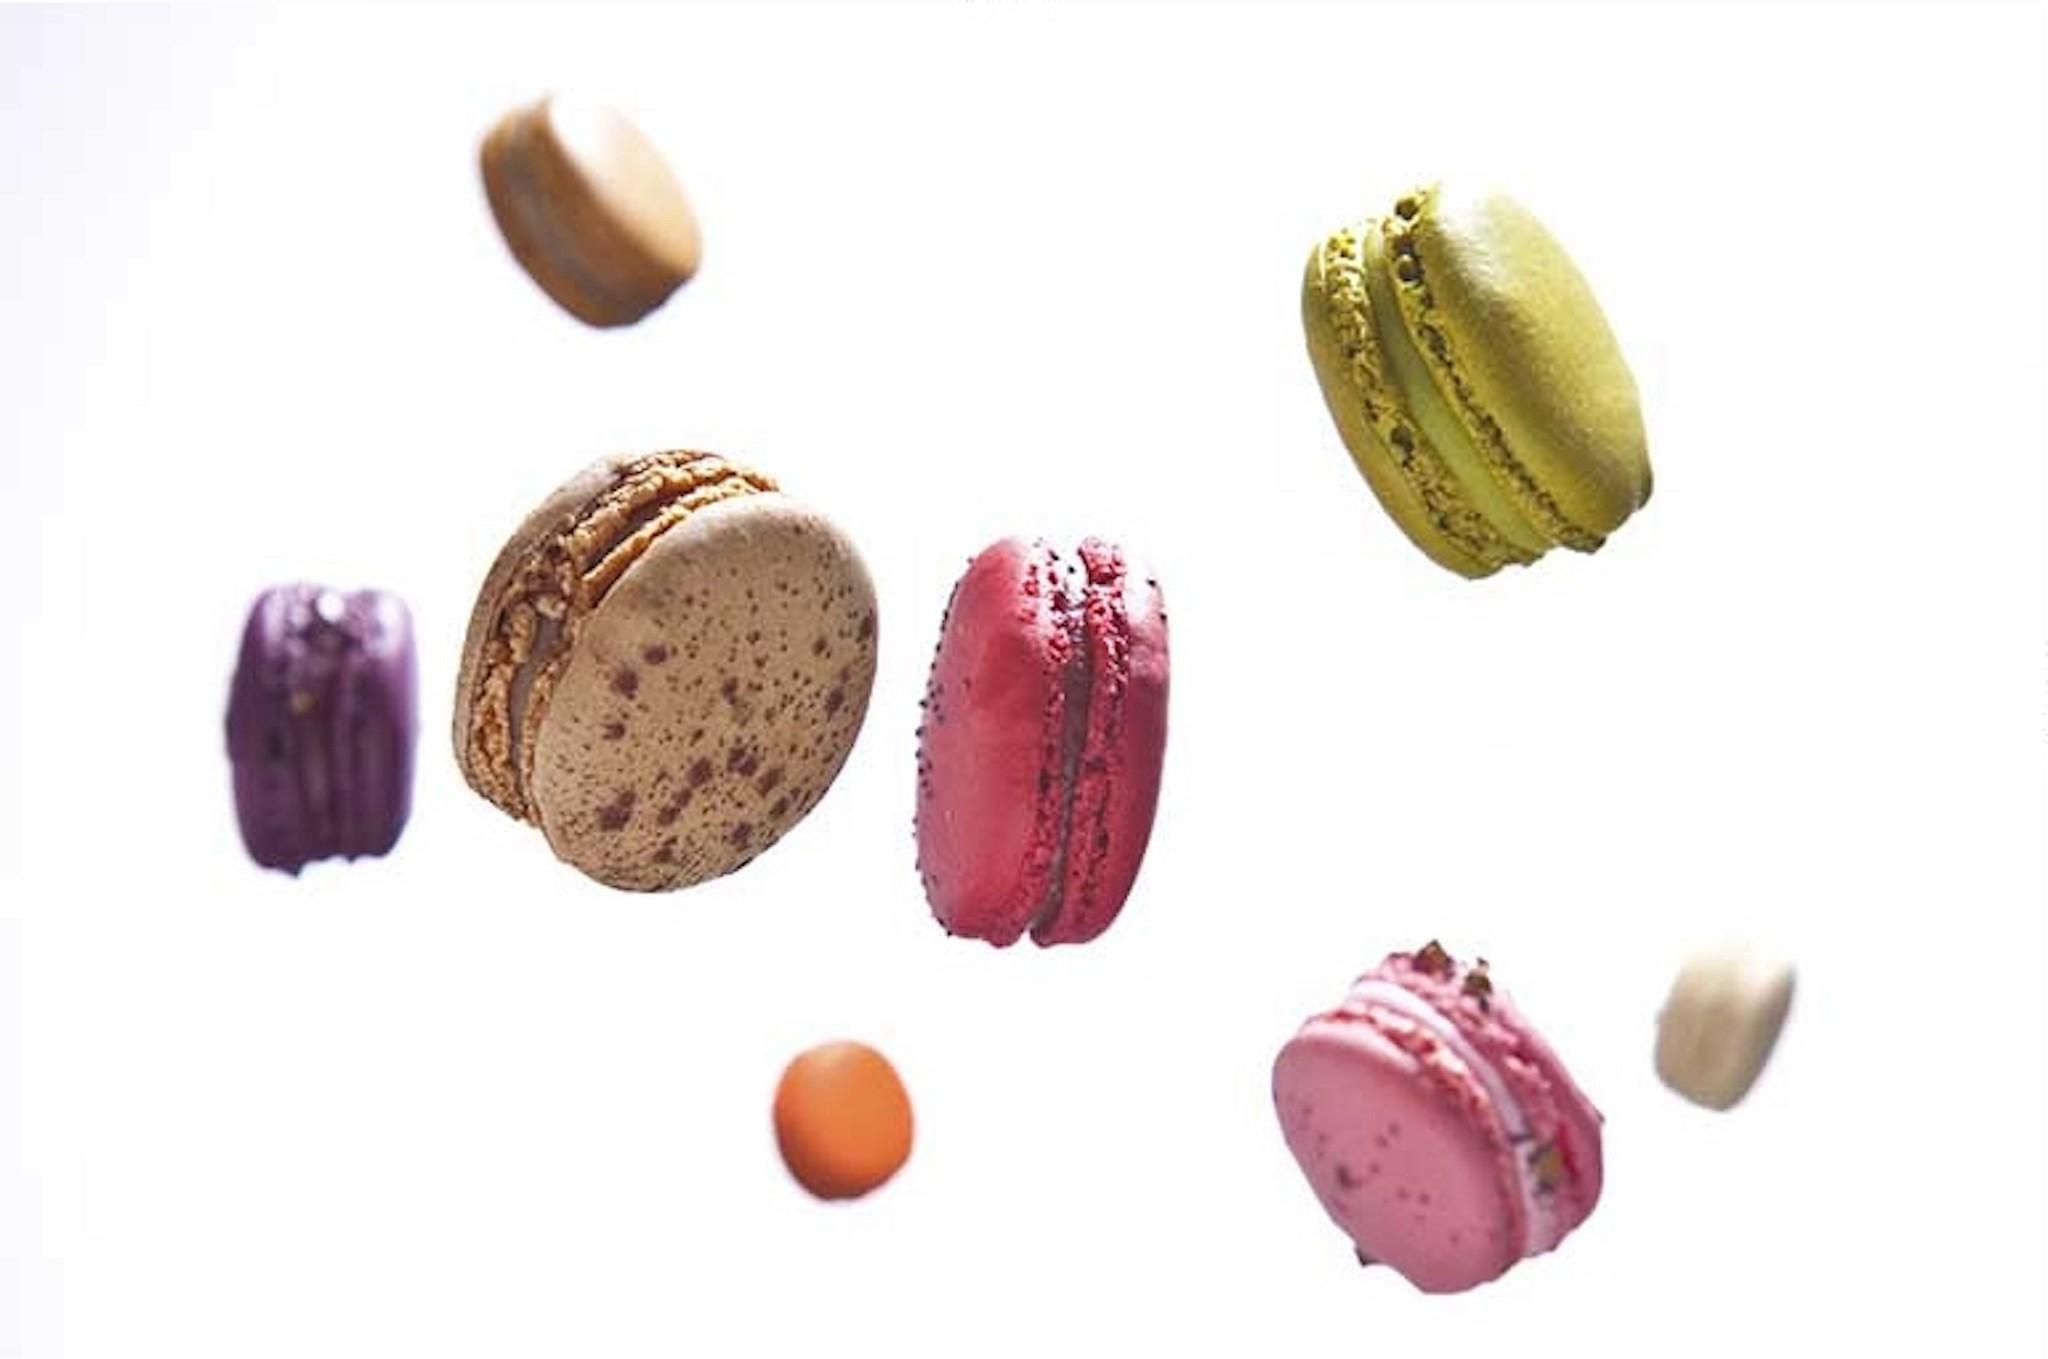 Carette Macarons │Courtesy of Carette